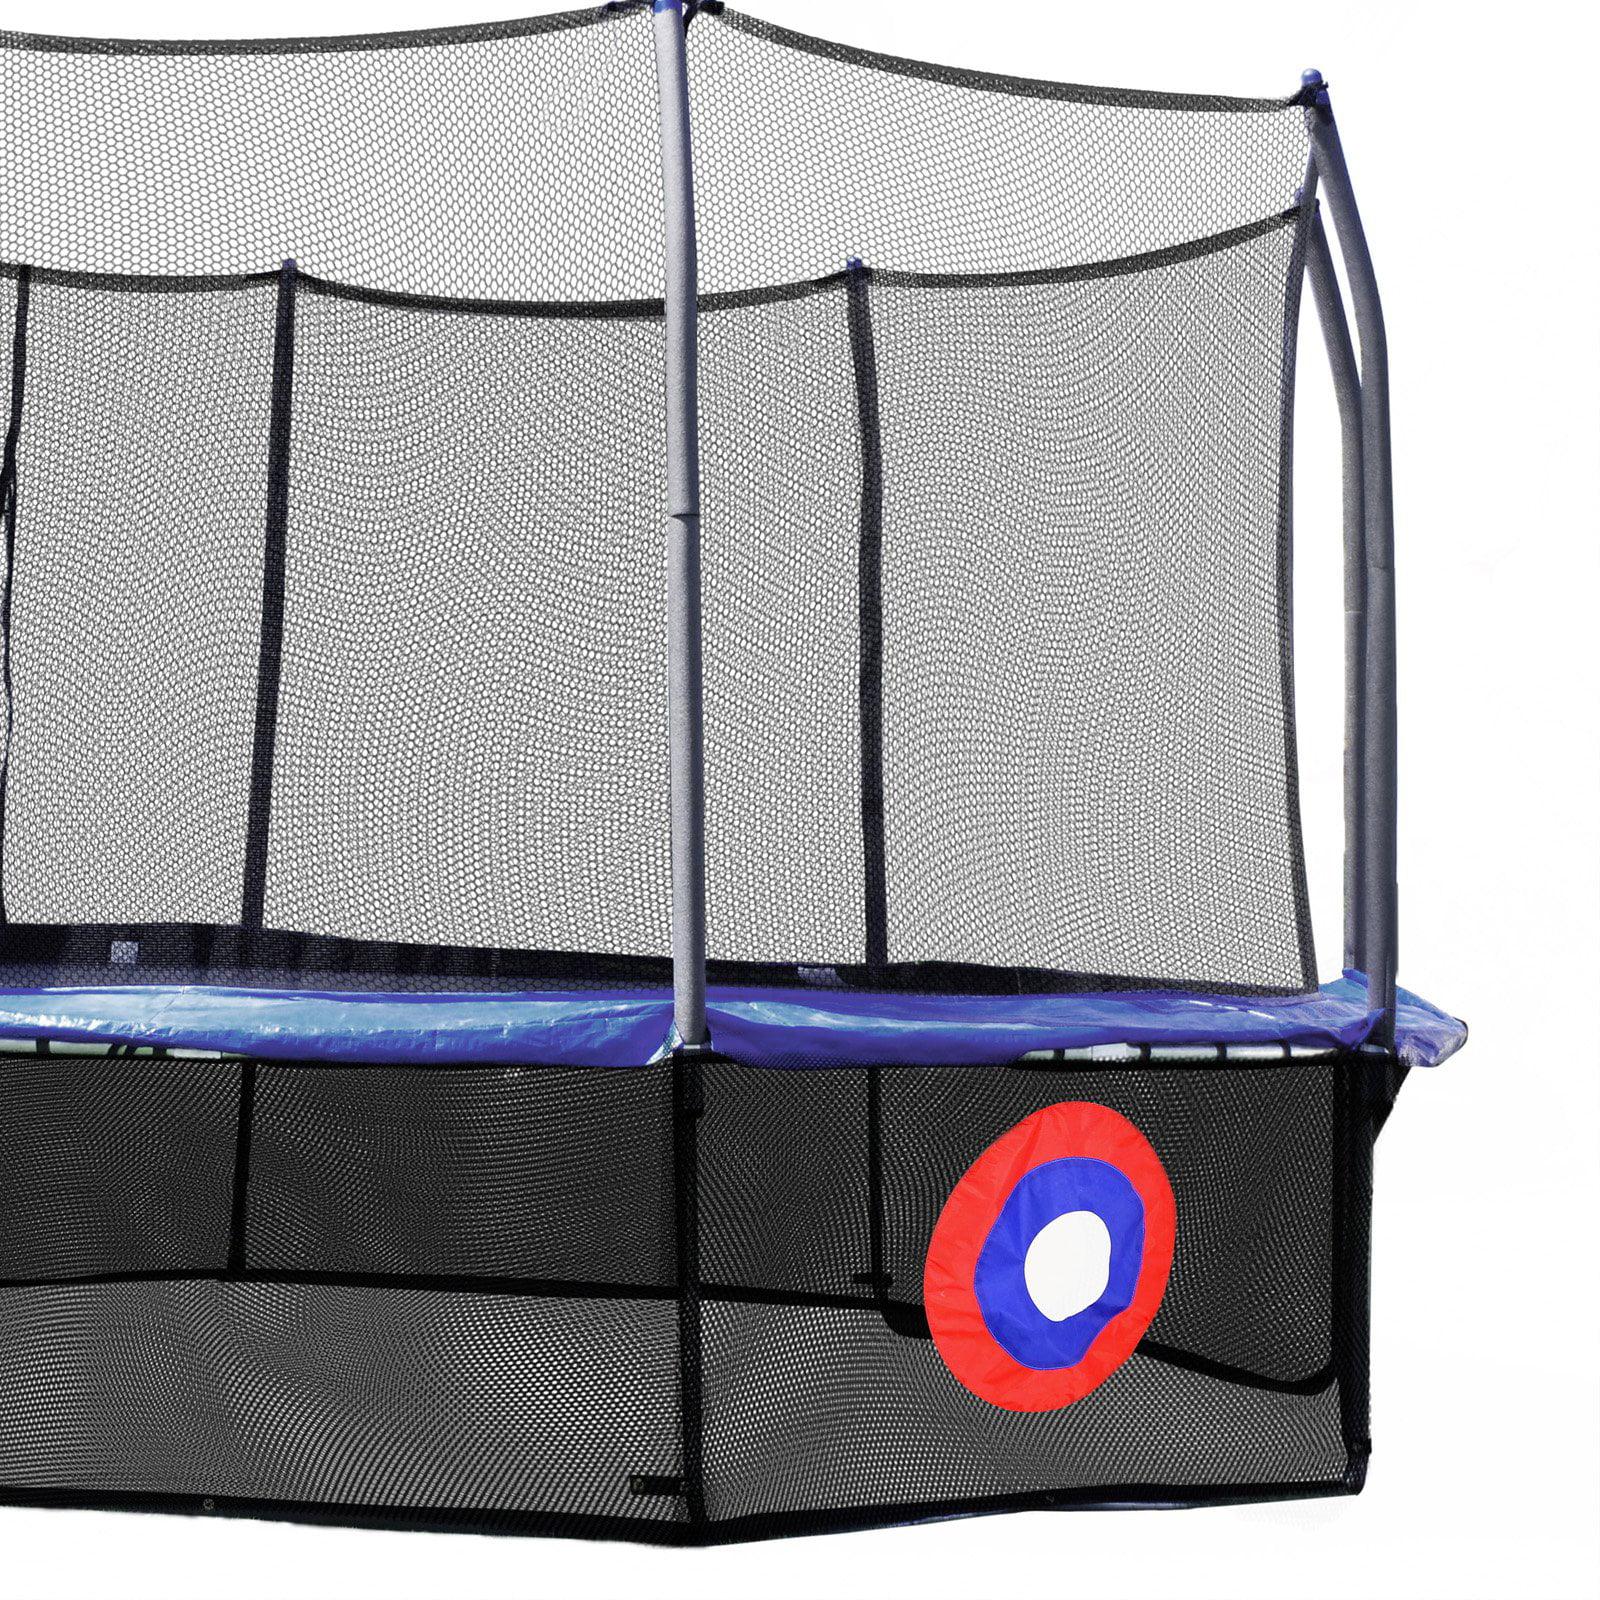 Skywalker Holdings Llc Skywalker Sports Sure Shot Lower Trampoline